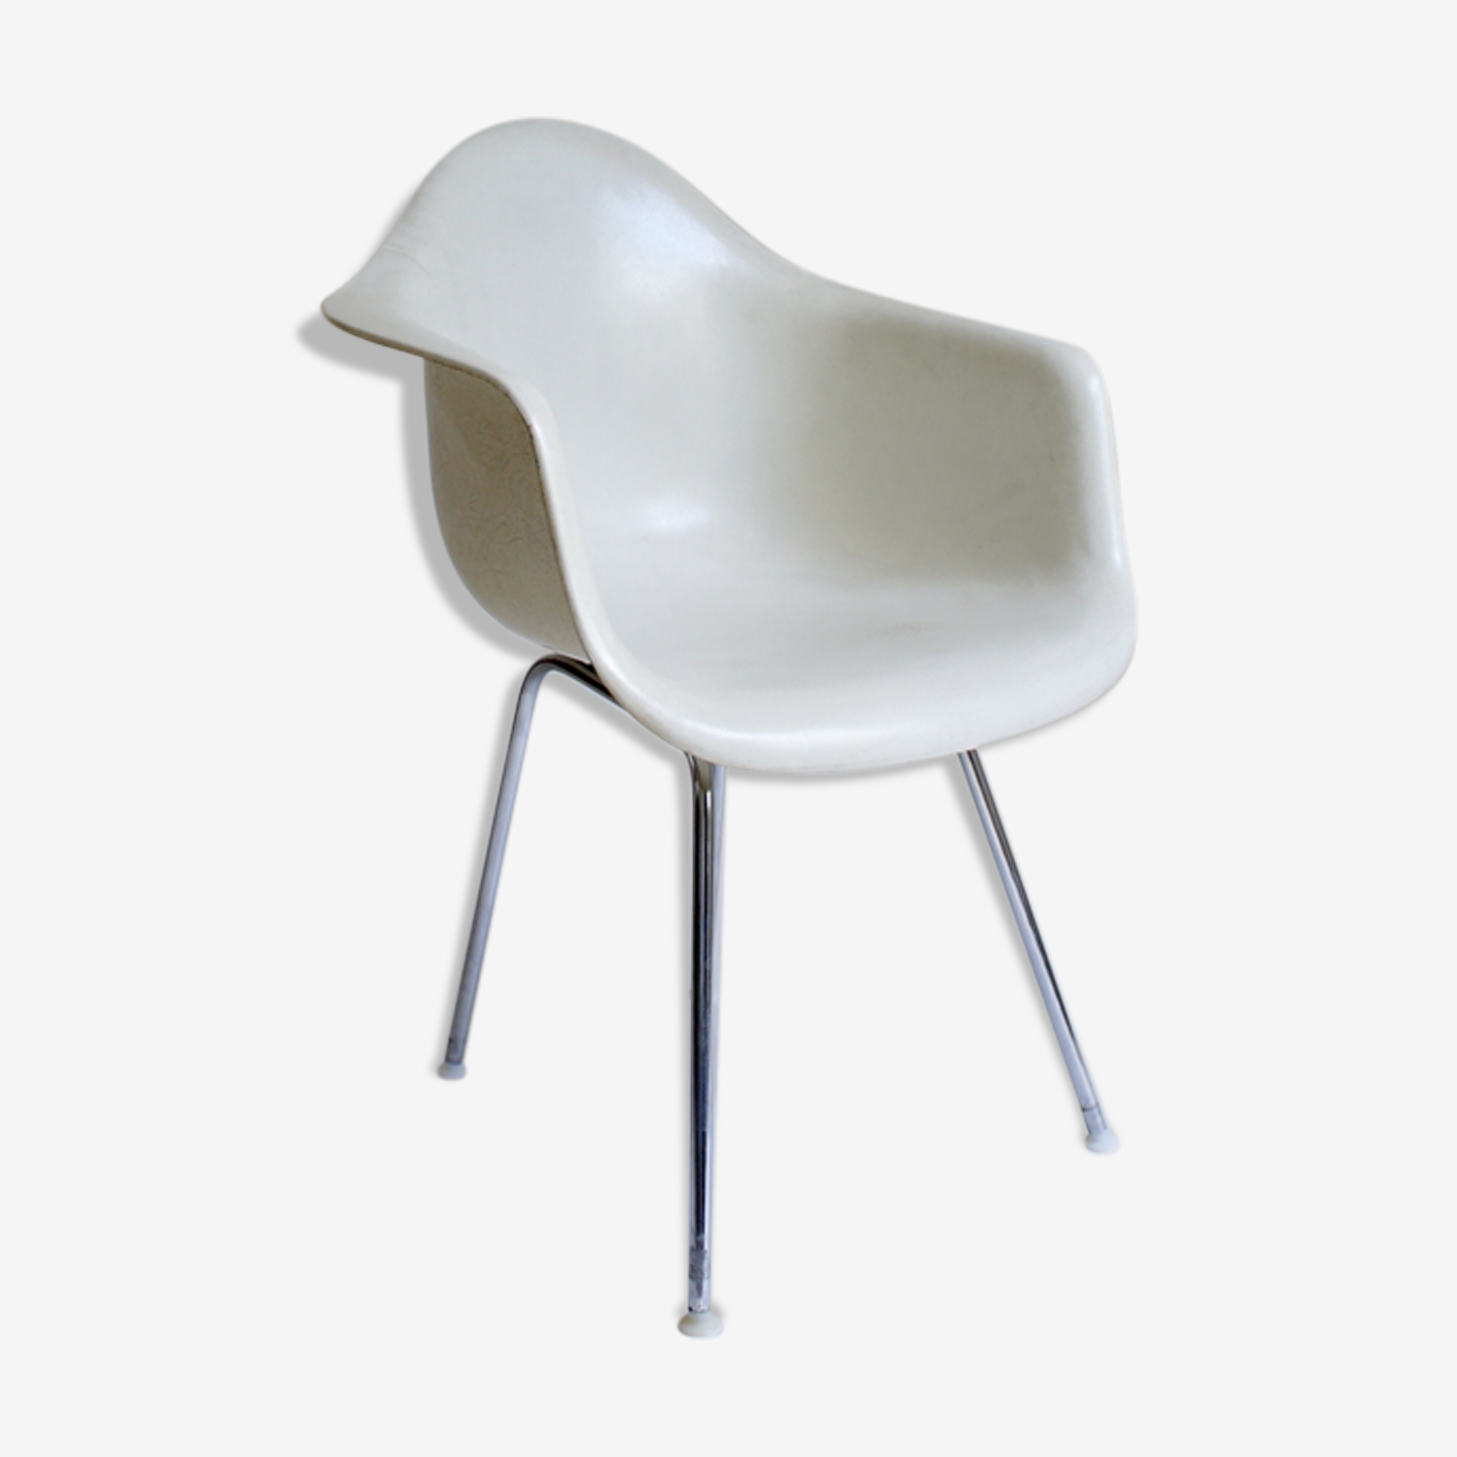 Fauteuil DAX de Ray et Charles Eames 1960